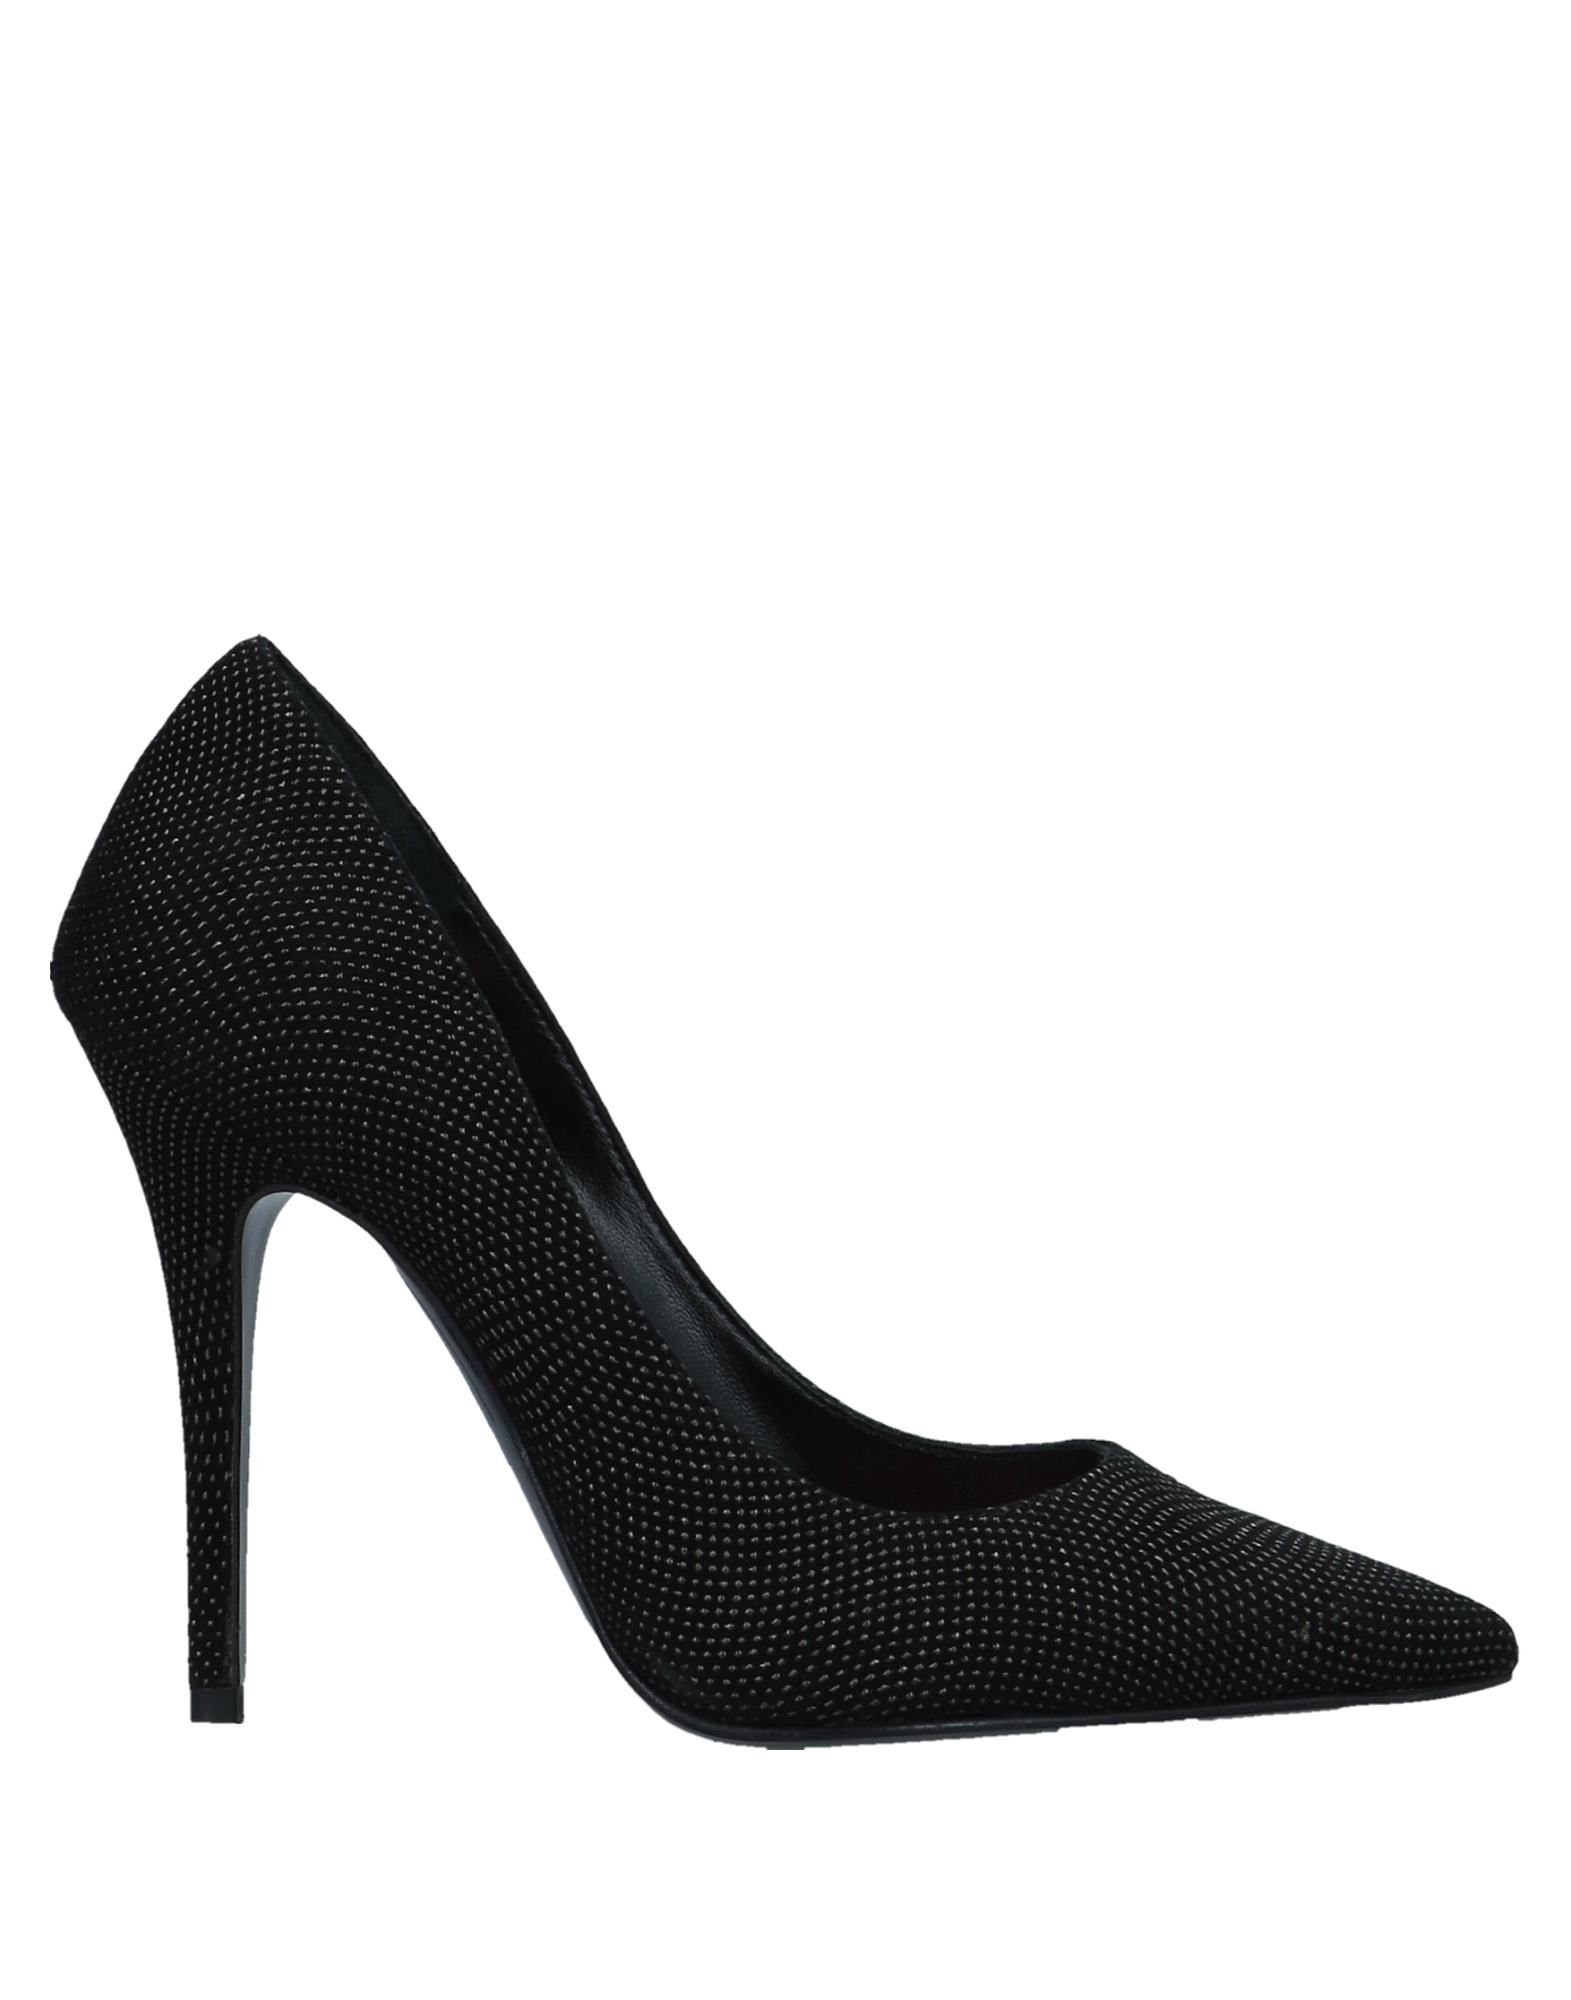 Sandali Unisa Donna - 11534320JF comode Nuove offerte e scarpe comode 11534320JF 38d641